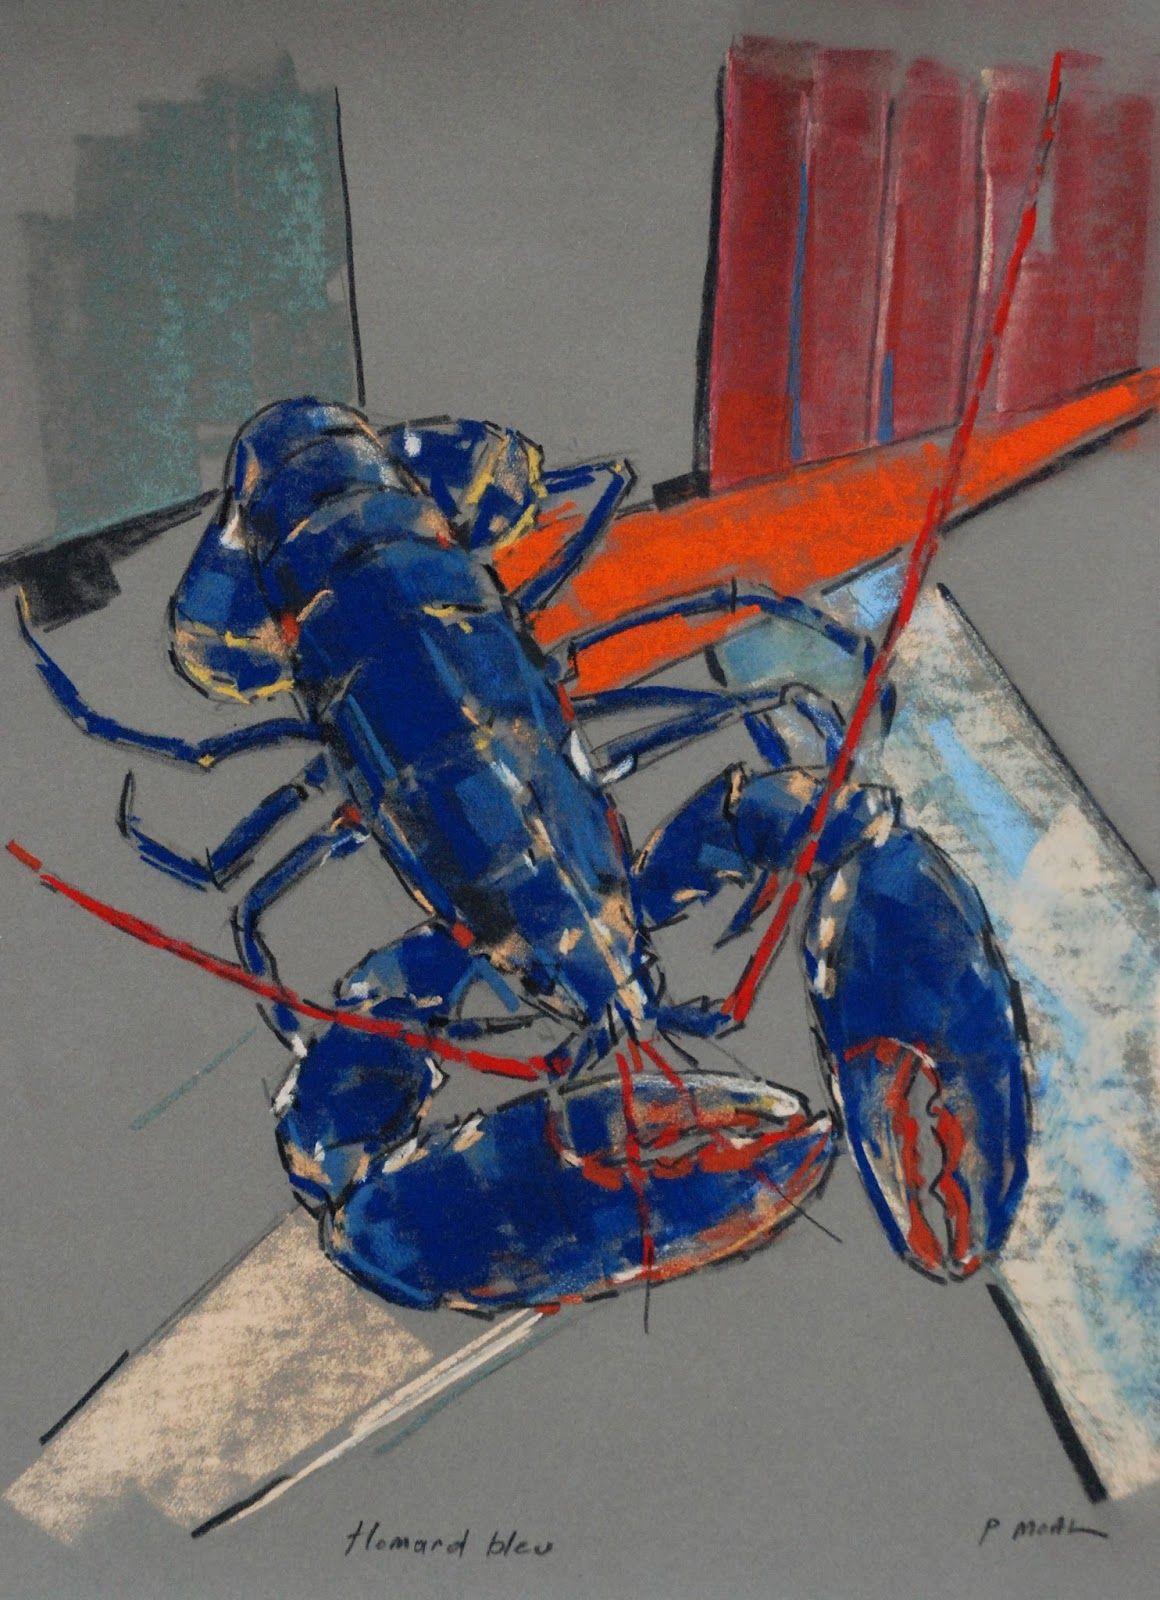 Quimper Faience Artistes Etc Toile Abstraite Homard Peinture